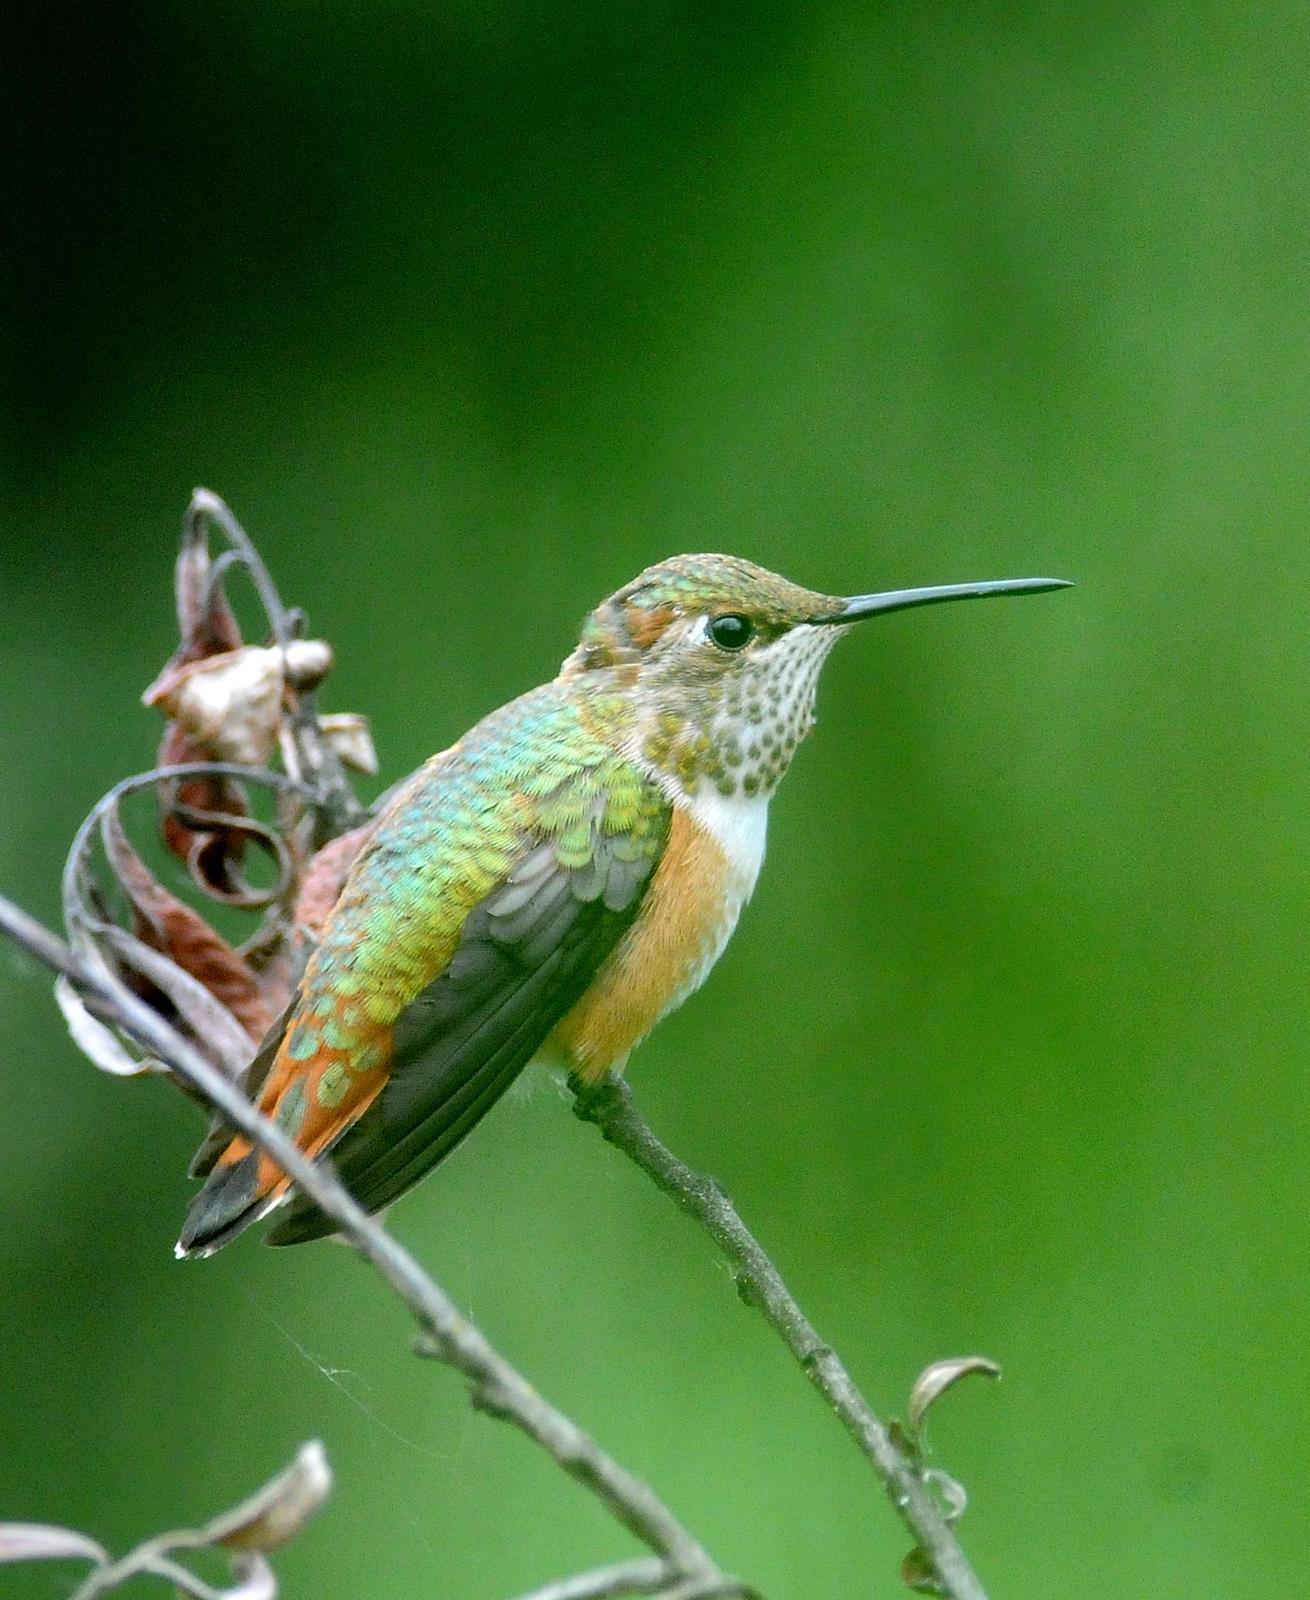 Rufous Hummingbird Photo by Steven Mlodinow